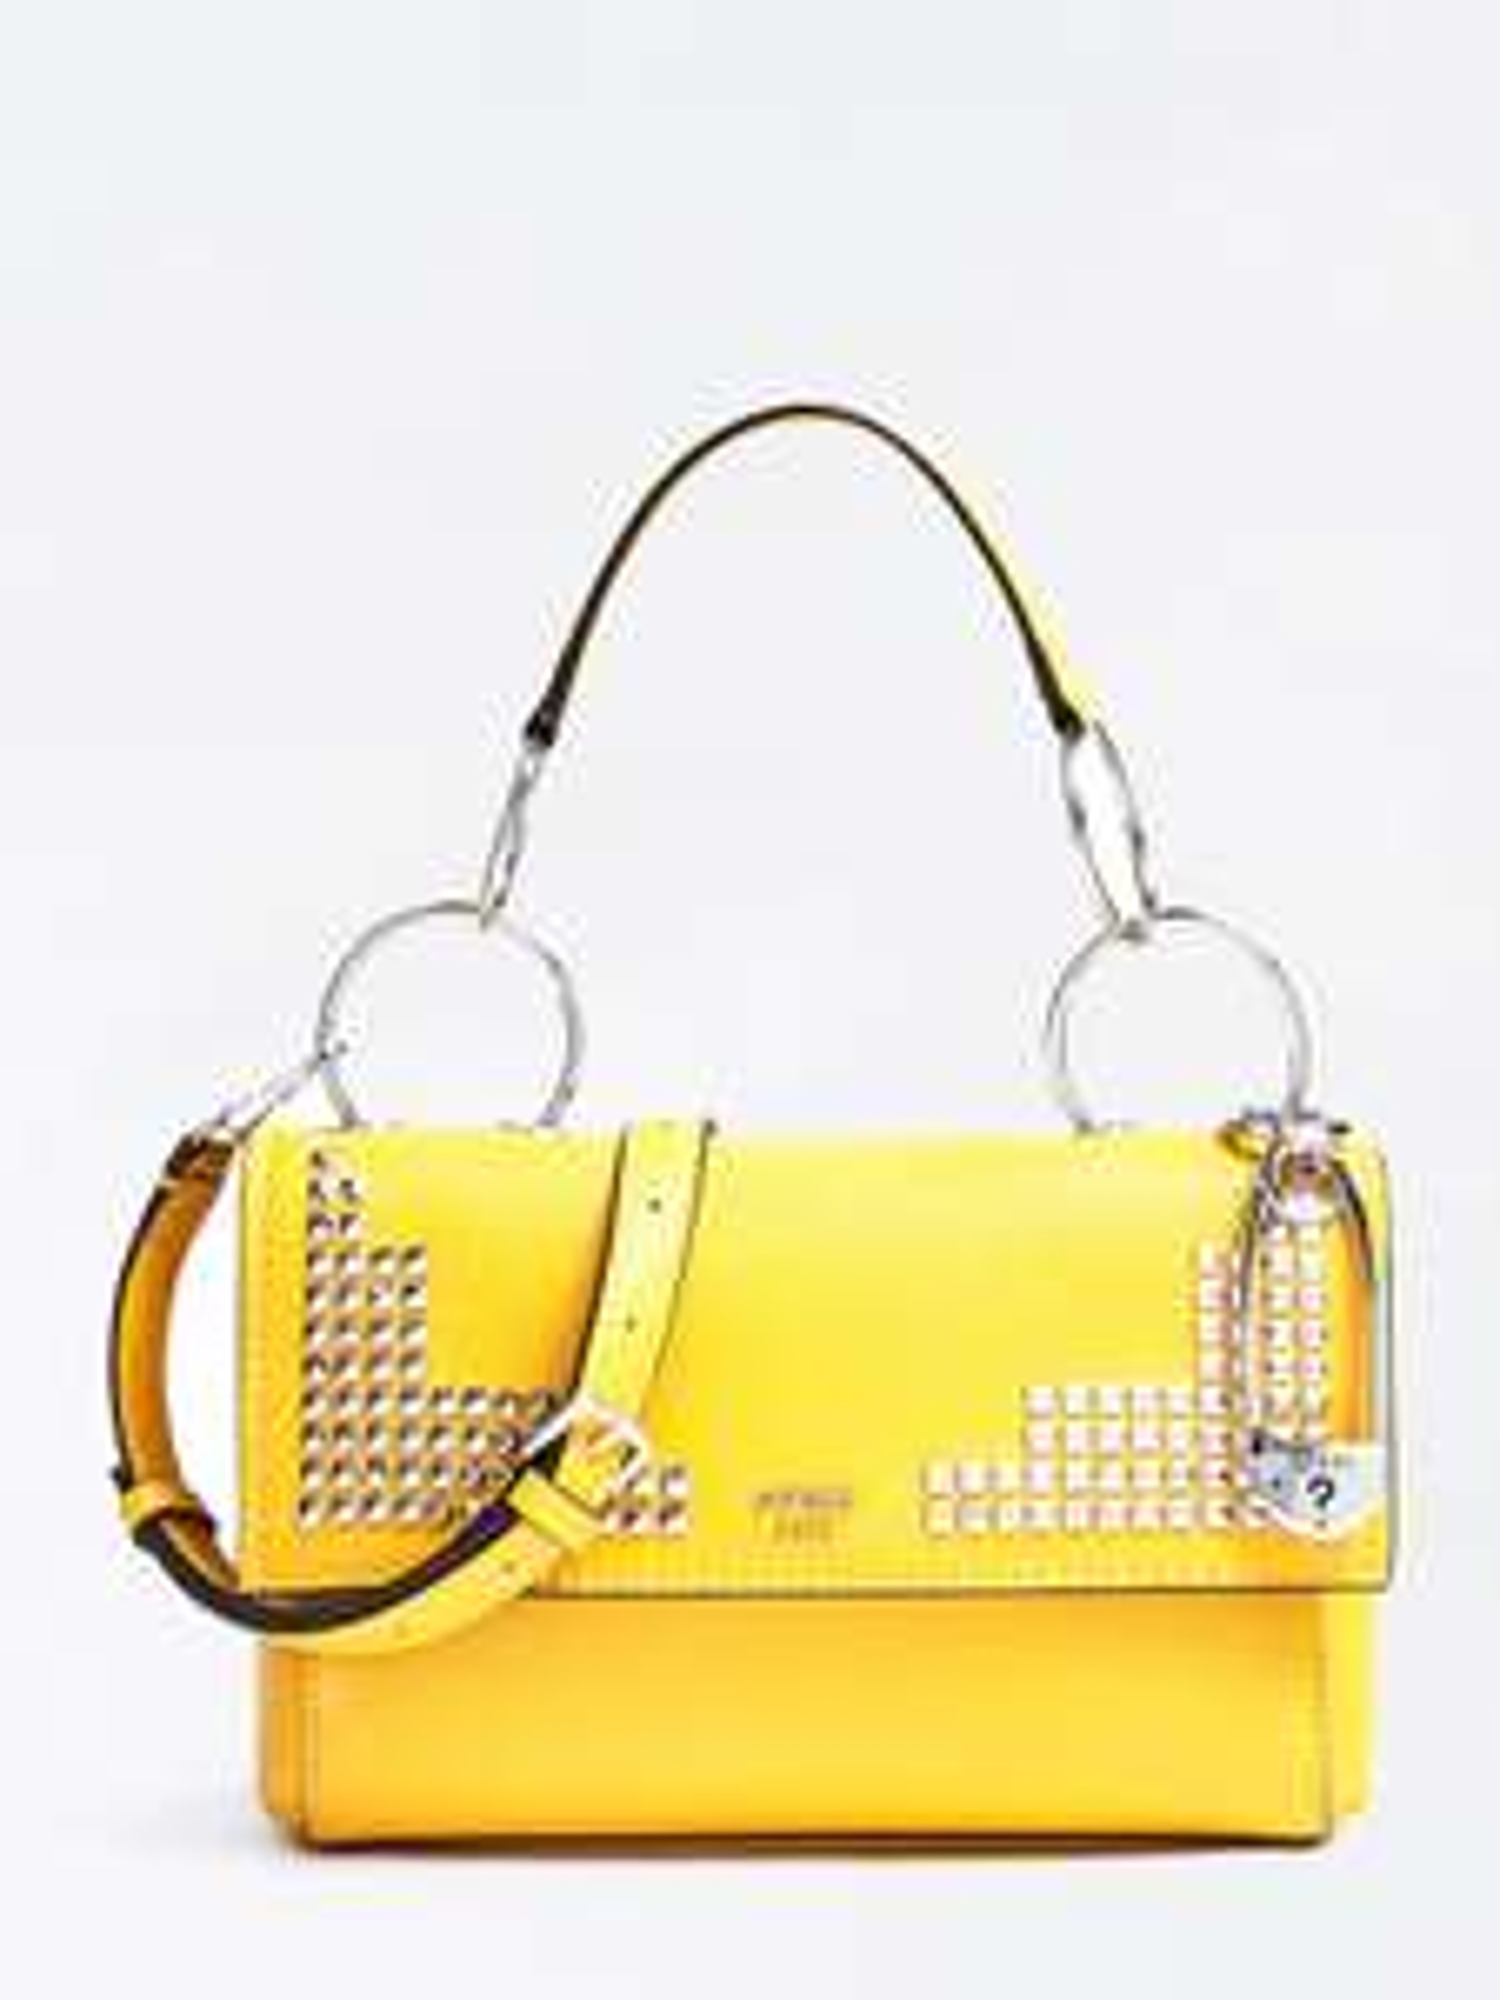 35% - 36% off Many Items @ Guess - E.G Gabi Crossbody Bag £61.50 / Onset Lace Bra £18.50